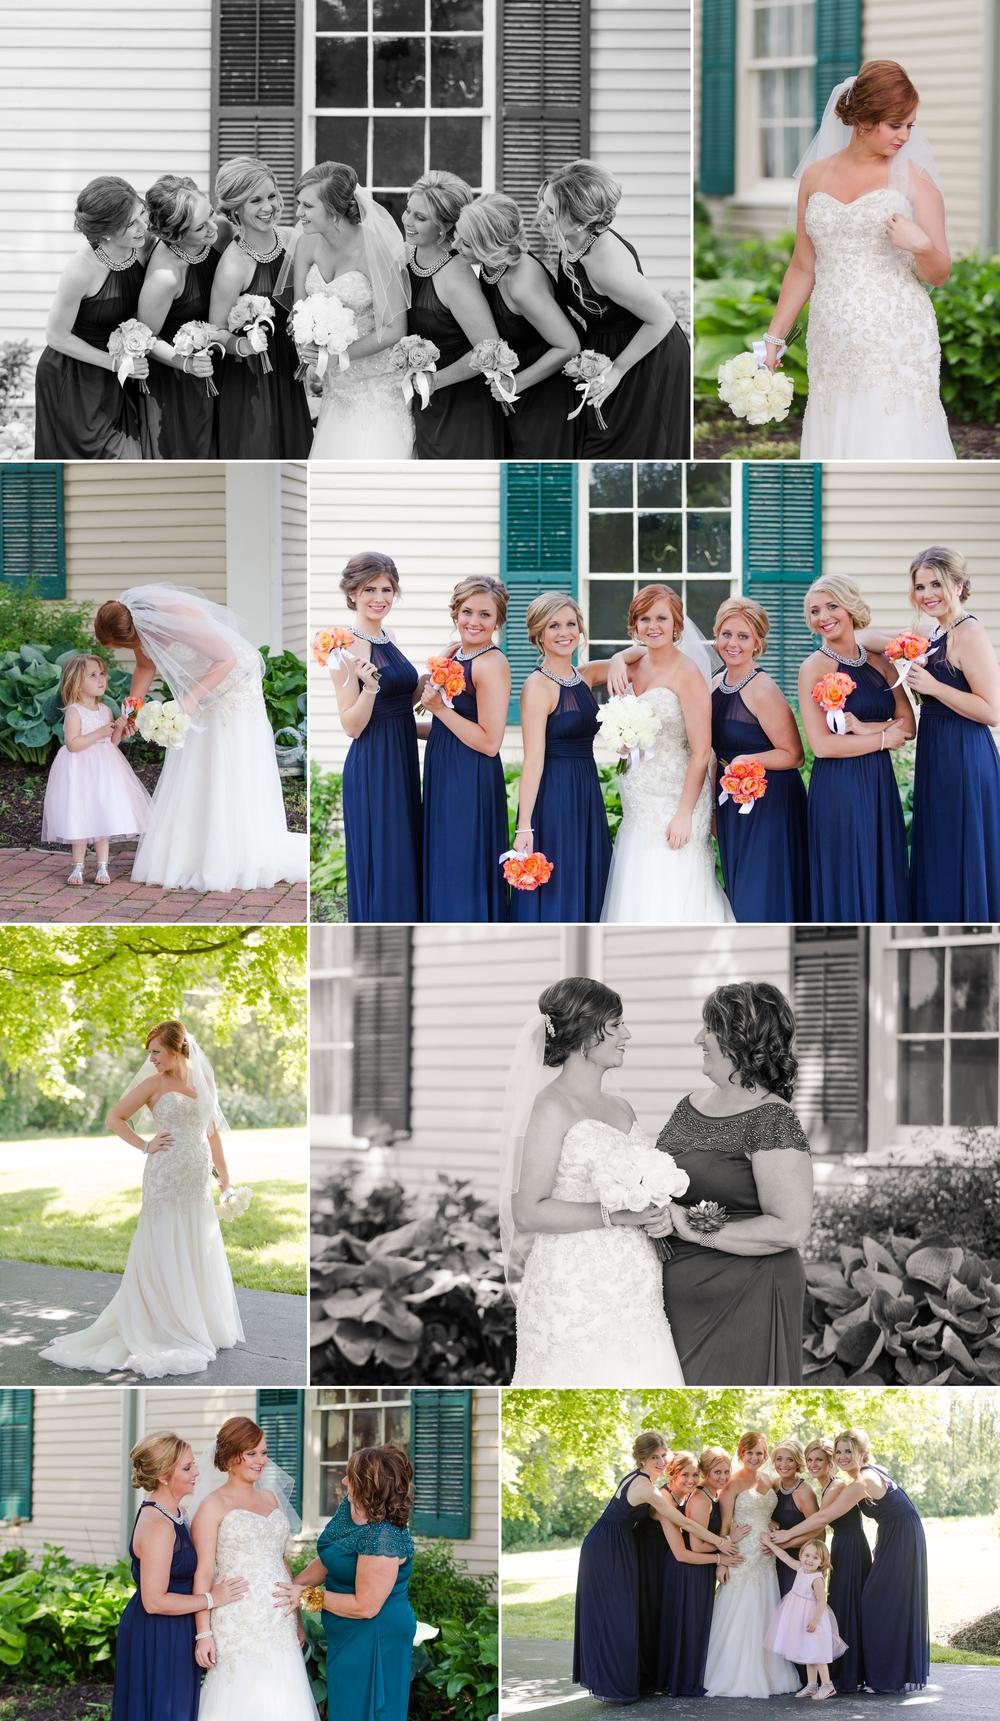 riverbend_chapel_washington_mo_wedding_photography_outdoor_venue_st_louis 2.jpg